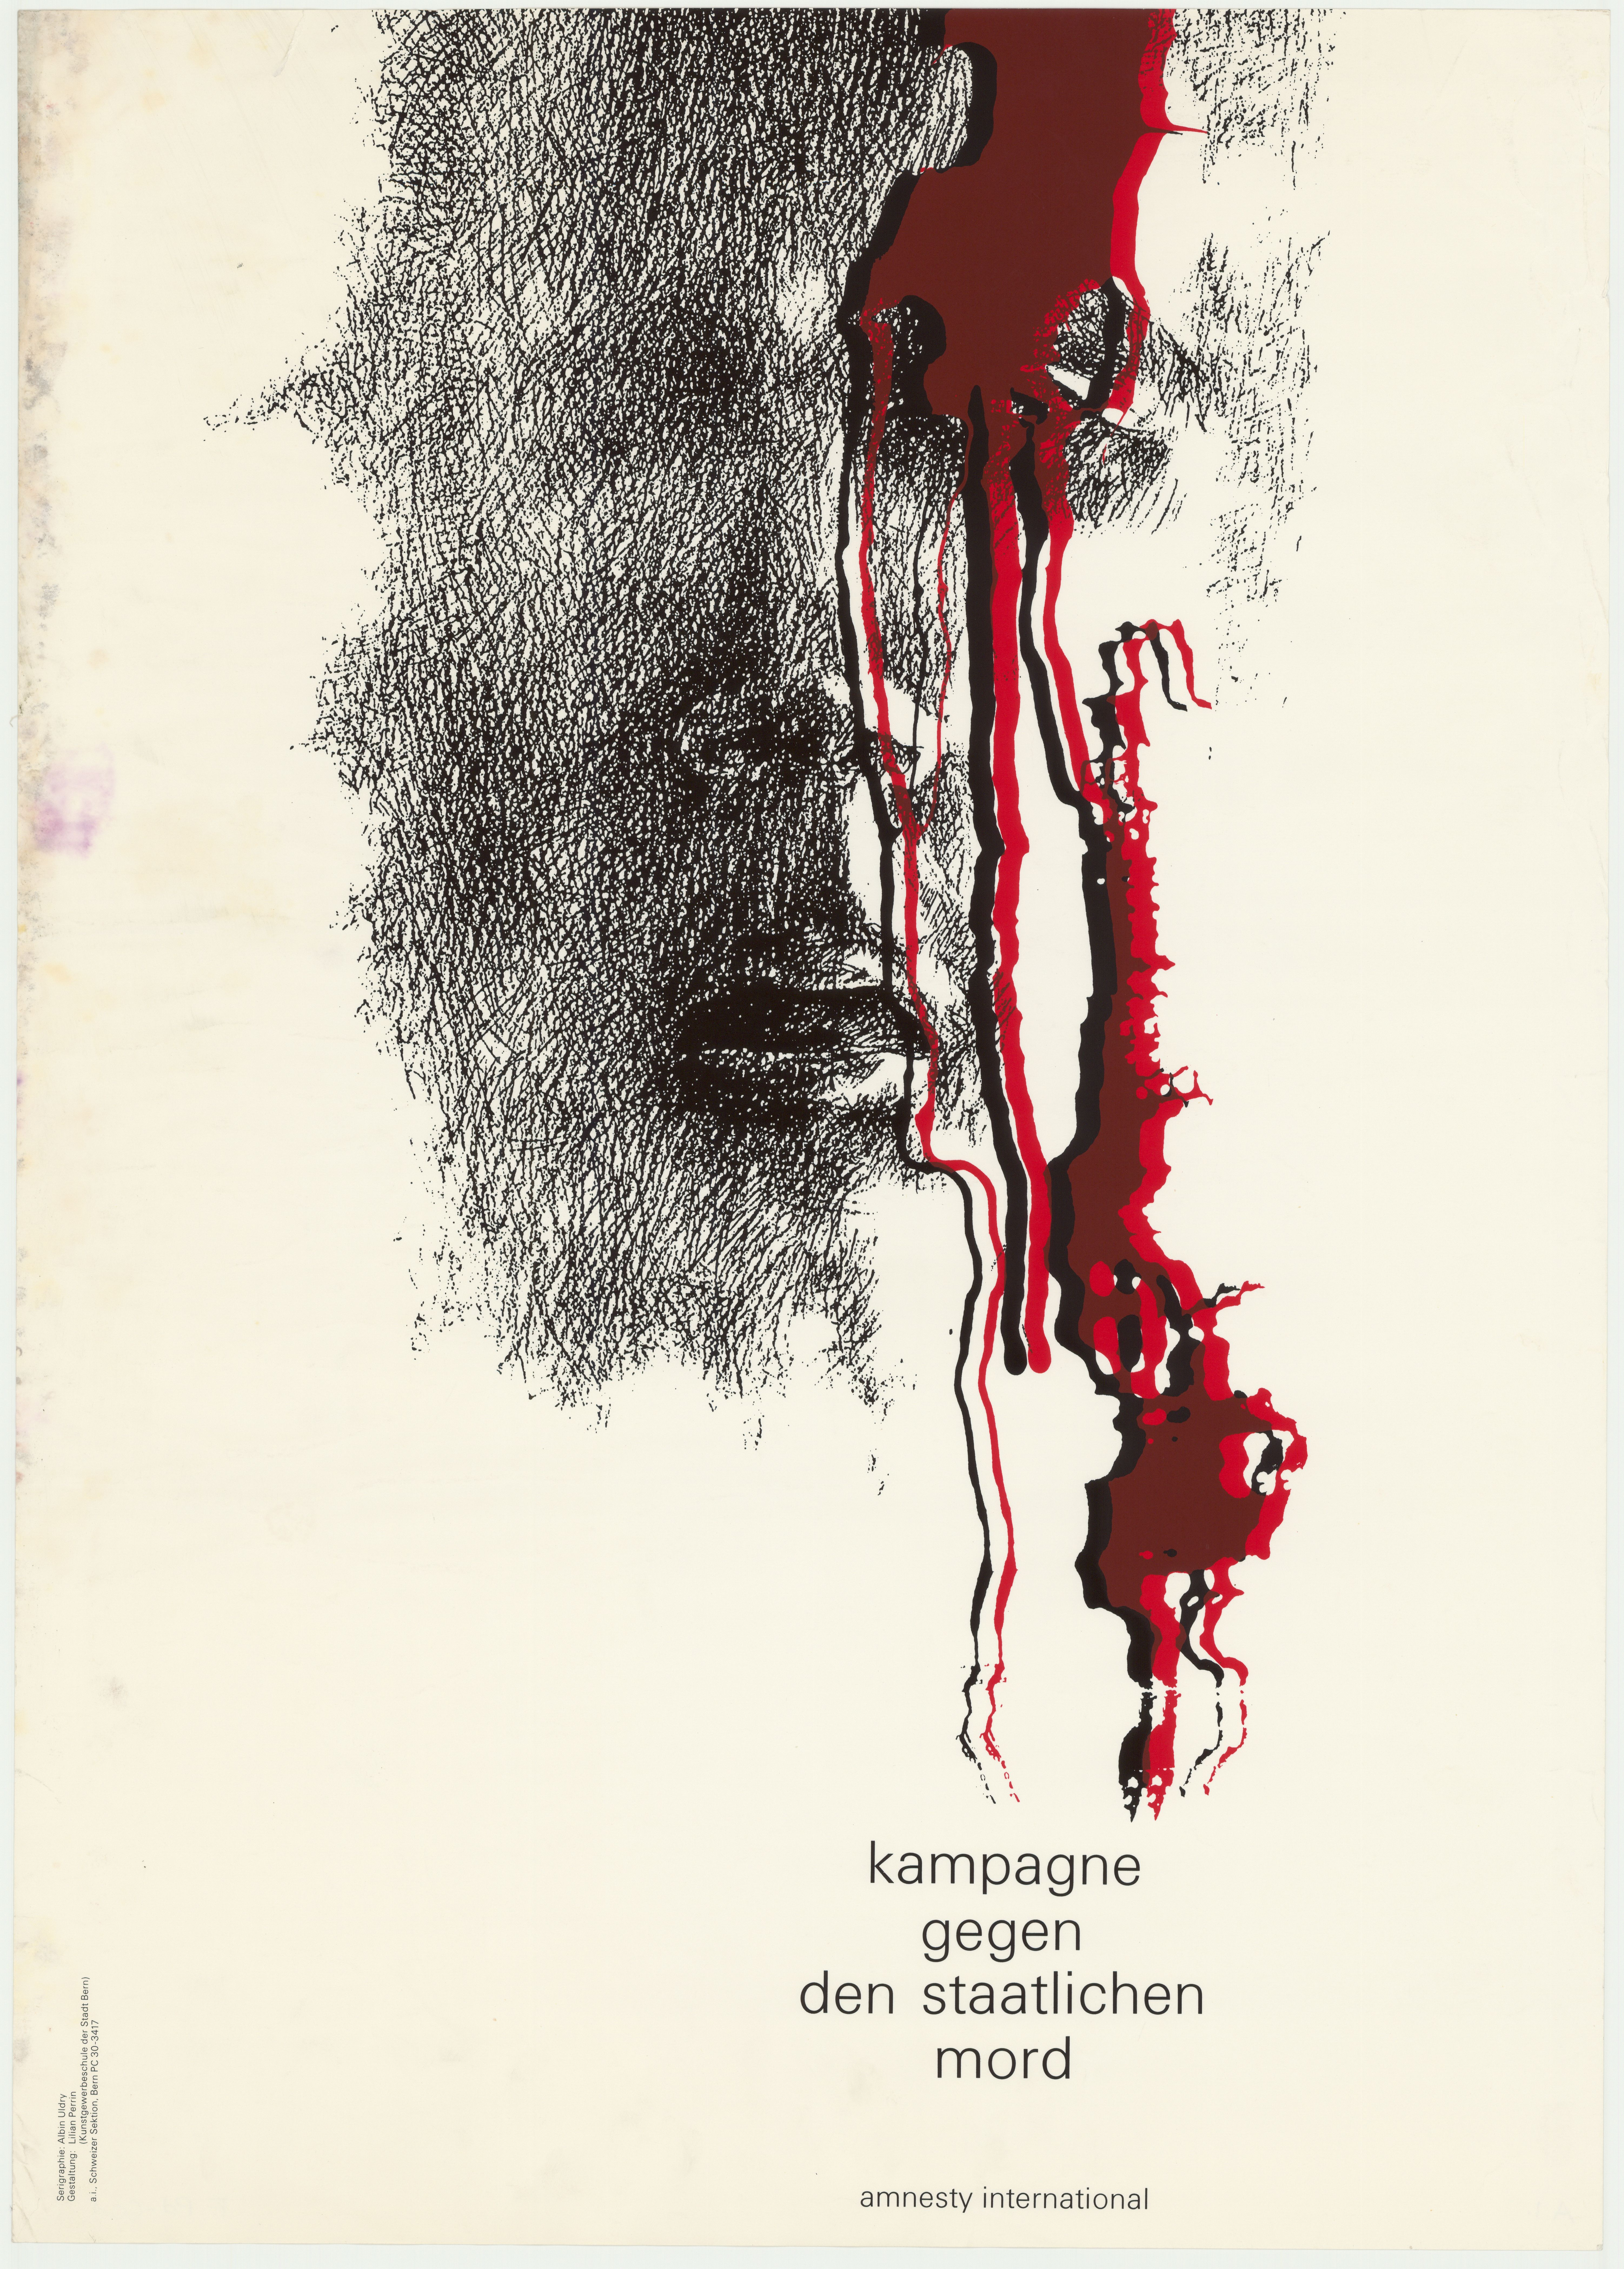 Vintage Poster: Kampagne gegen den staatlichen Mord